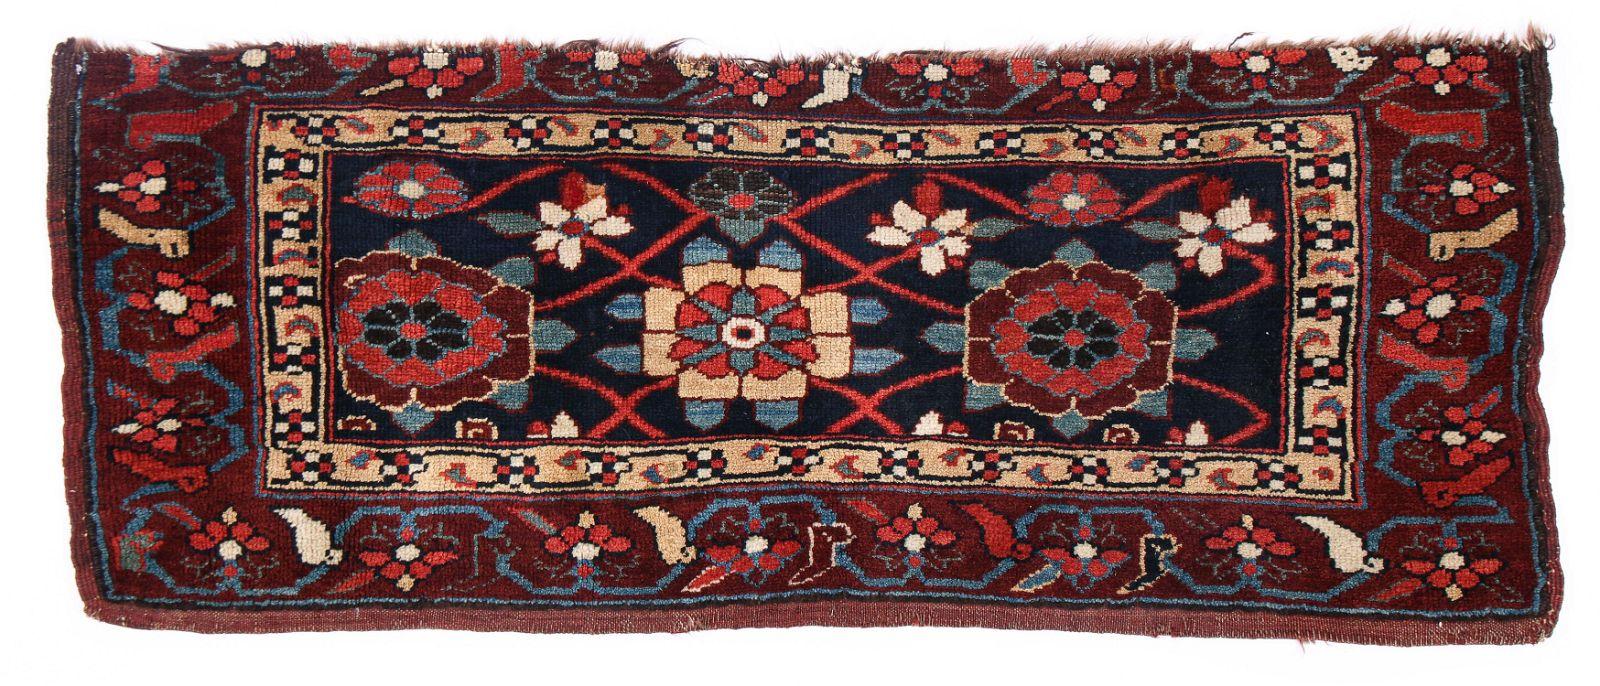 West Persian Kurd Rug, Late 19th C., 3'8'' x 1'4''